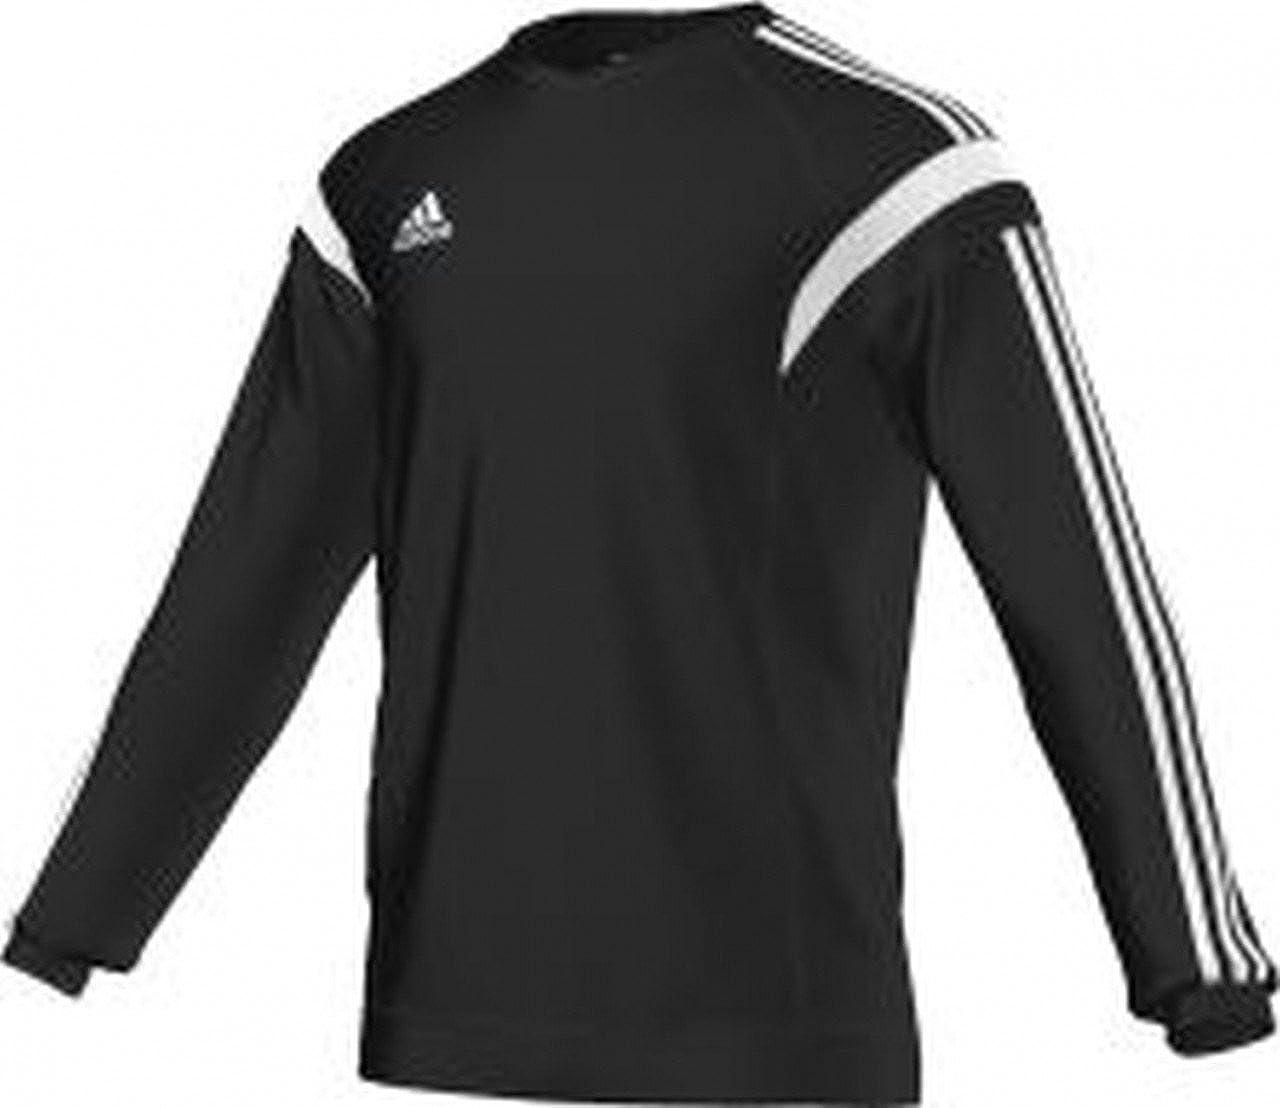 adidas Condivo Sweat Top Clothing Football Multi Coloured